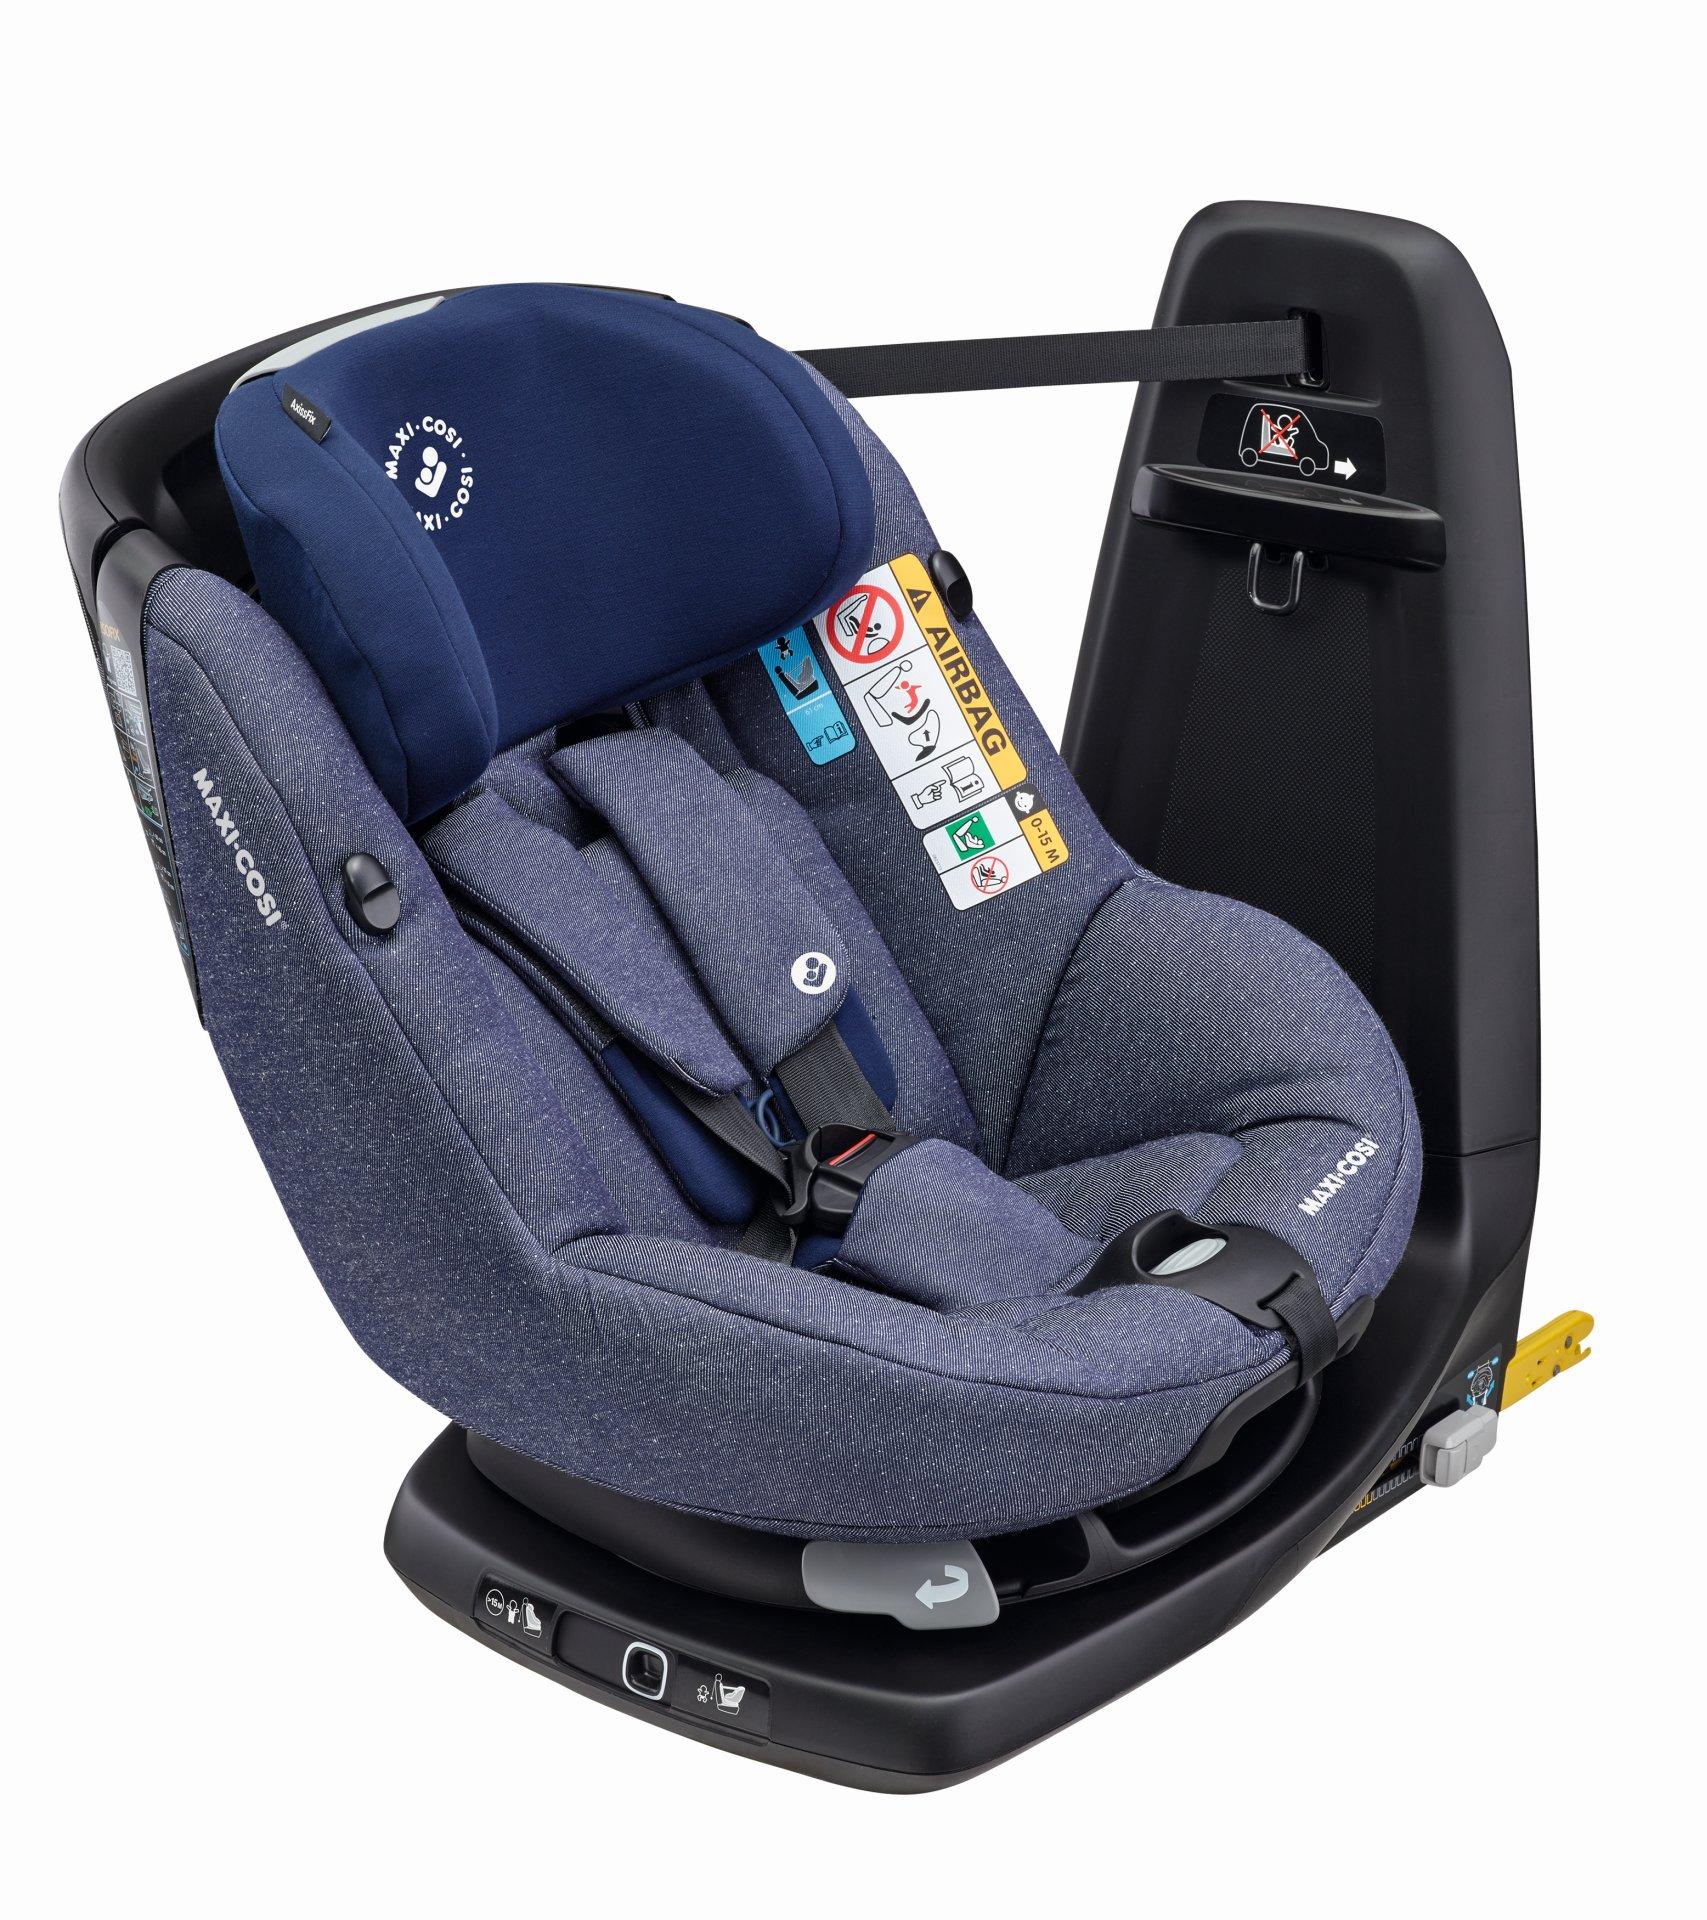 maxi cosi kindersitz axissfix 2019 sparkling blue online kaufen bei kidsroom kindersitze. Black Bedroom Furniture Sets. Home Design Ideas